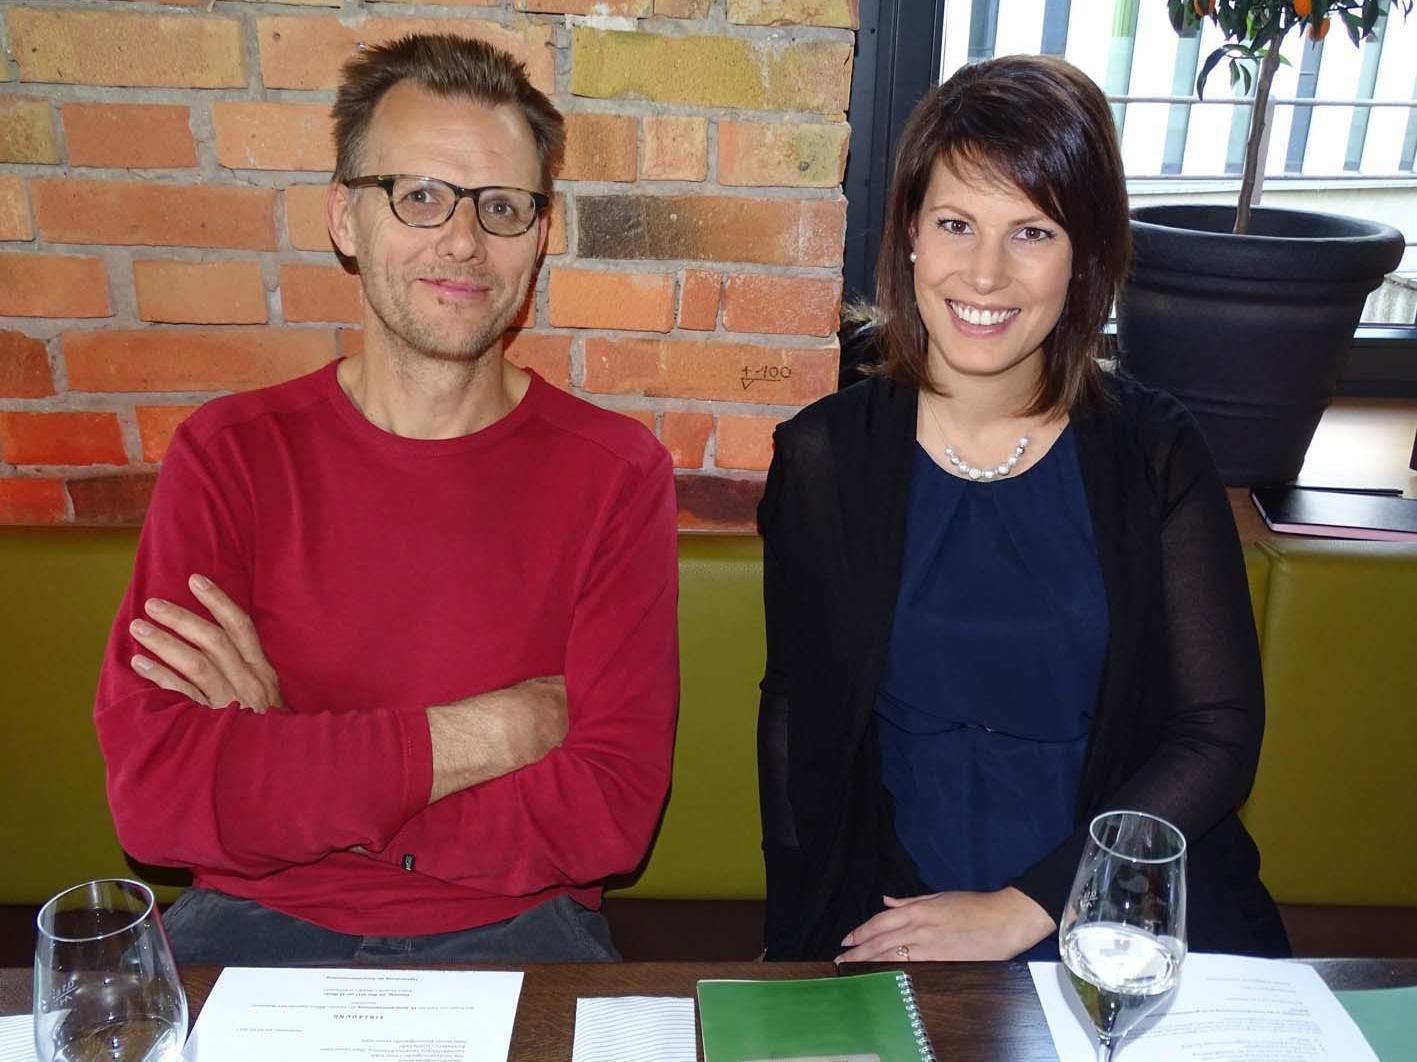 Dr. Joachim Wohlgenannt gab sein Amt an die neue OJAH-Obfrau Eelke Niesten ab.